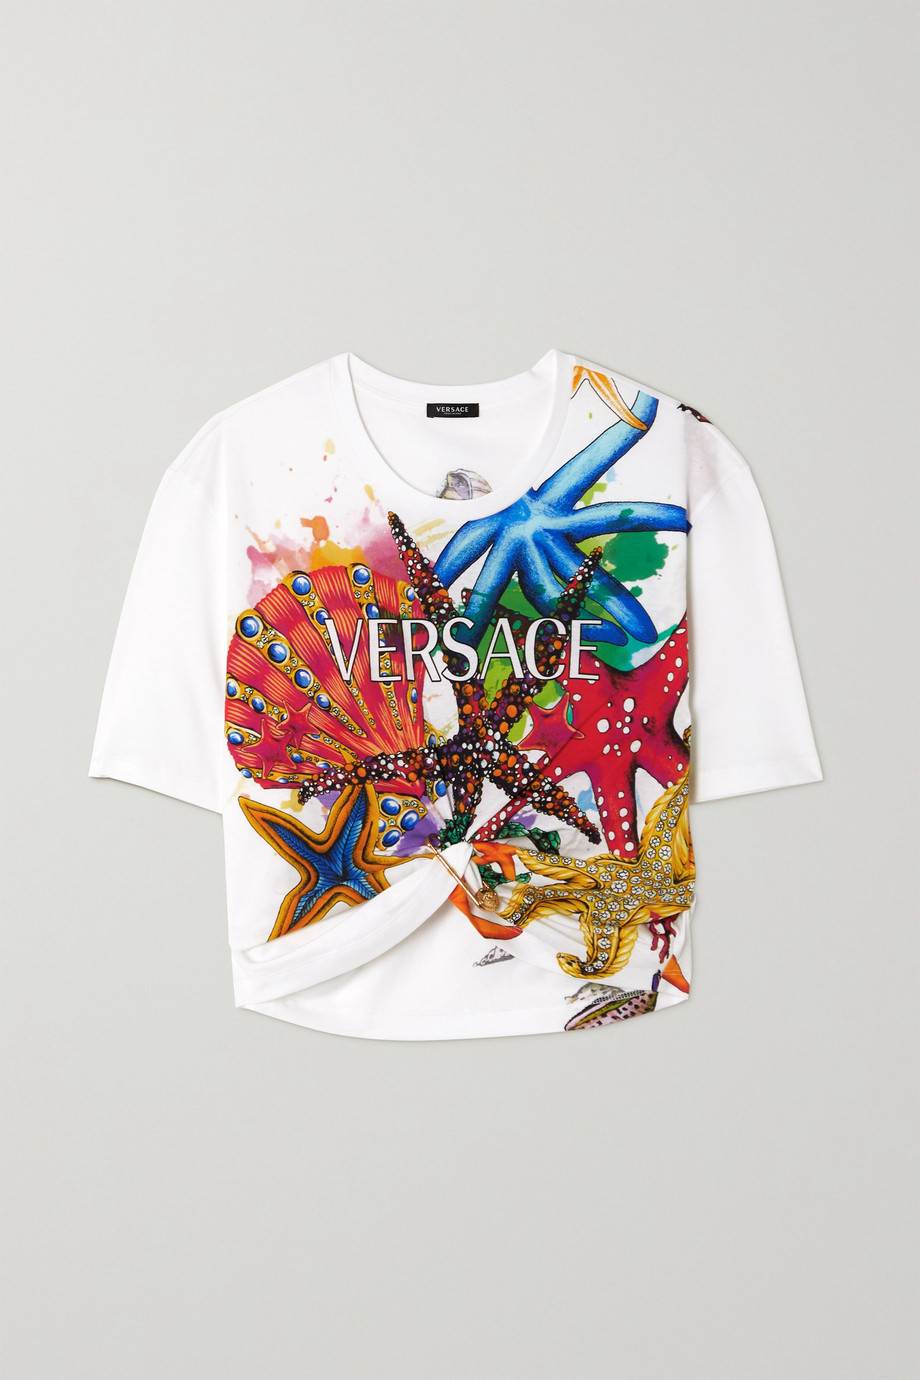 Versace La Medusa verkürztes T-Shirt aus Baumwoll-Jersey mit Print und Verzierung